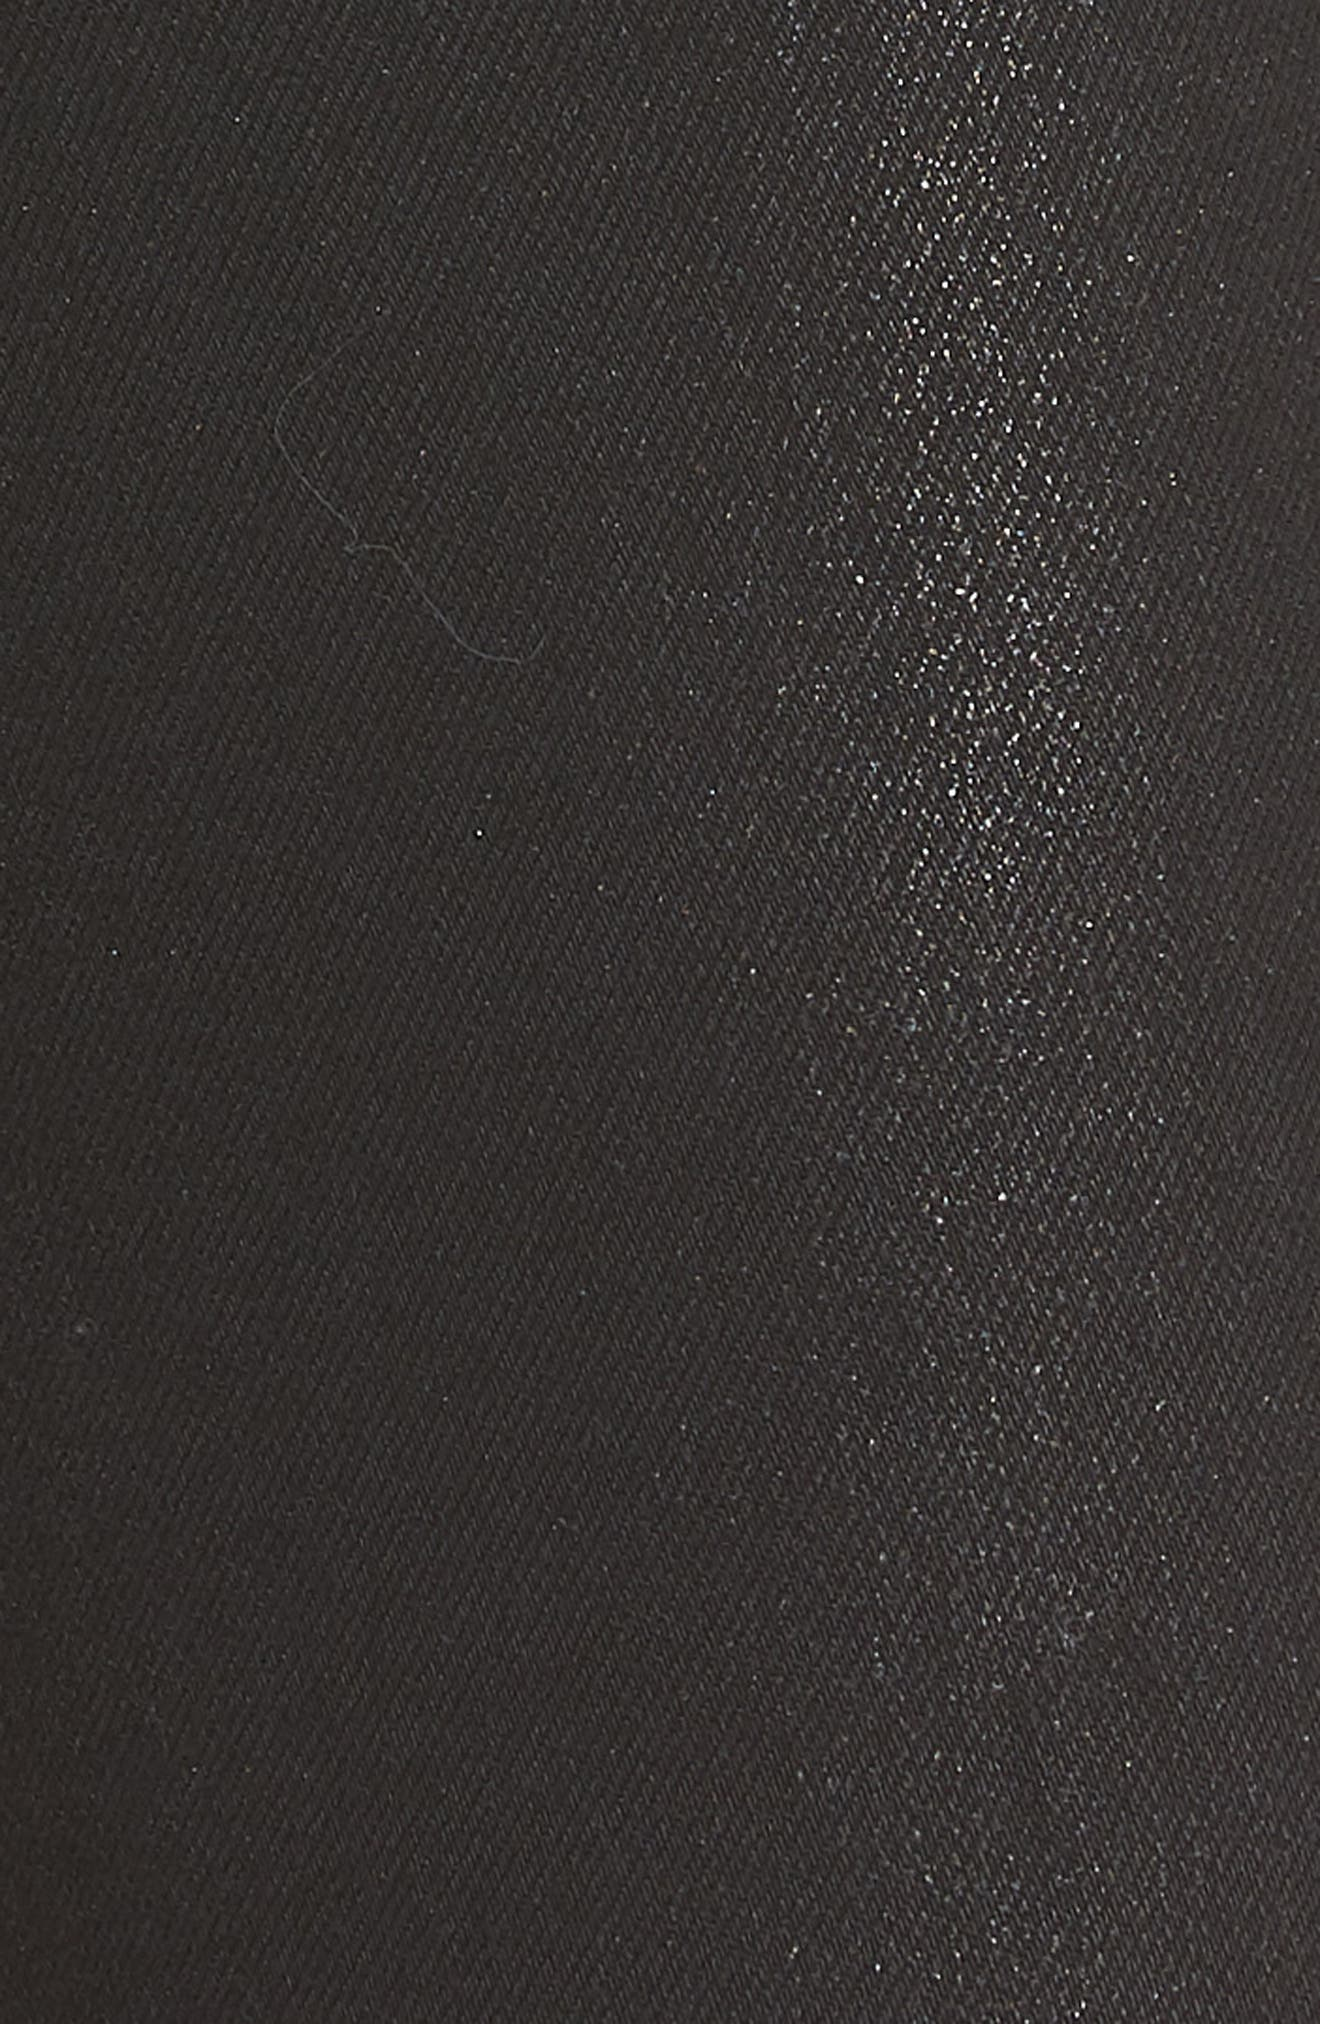 Bullocks High Waist Lace-Up Skinny Jeans,                             Alternate thumbnail 5, color,                             001